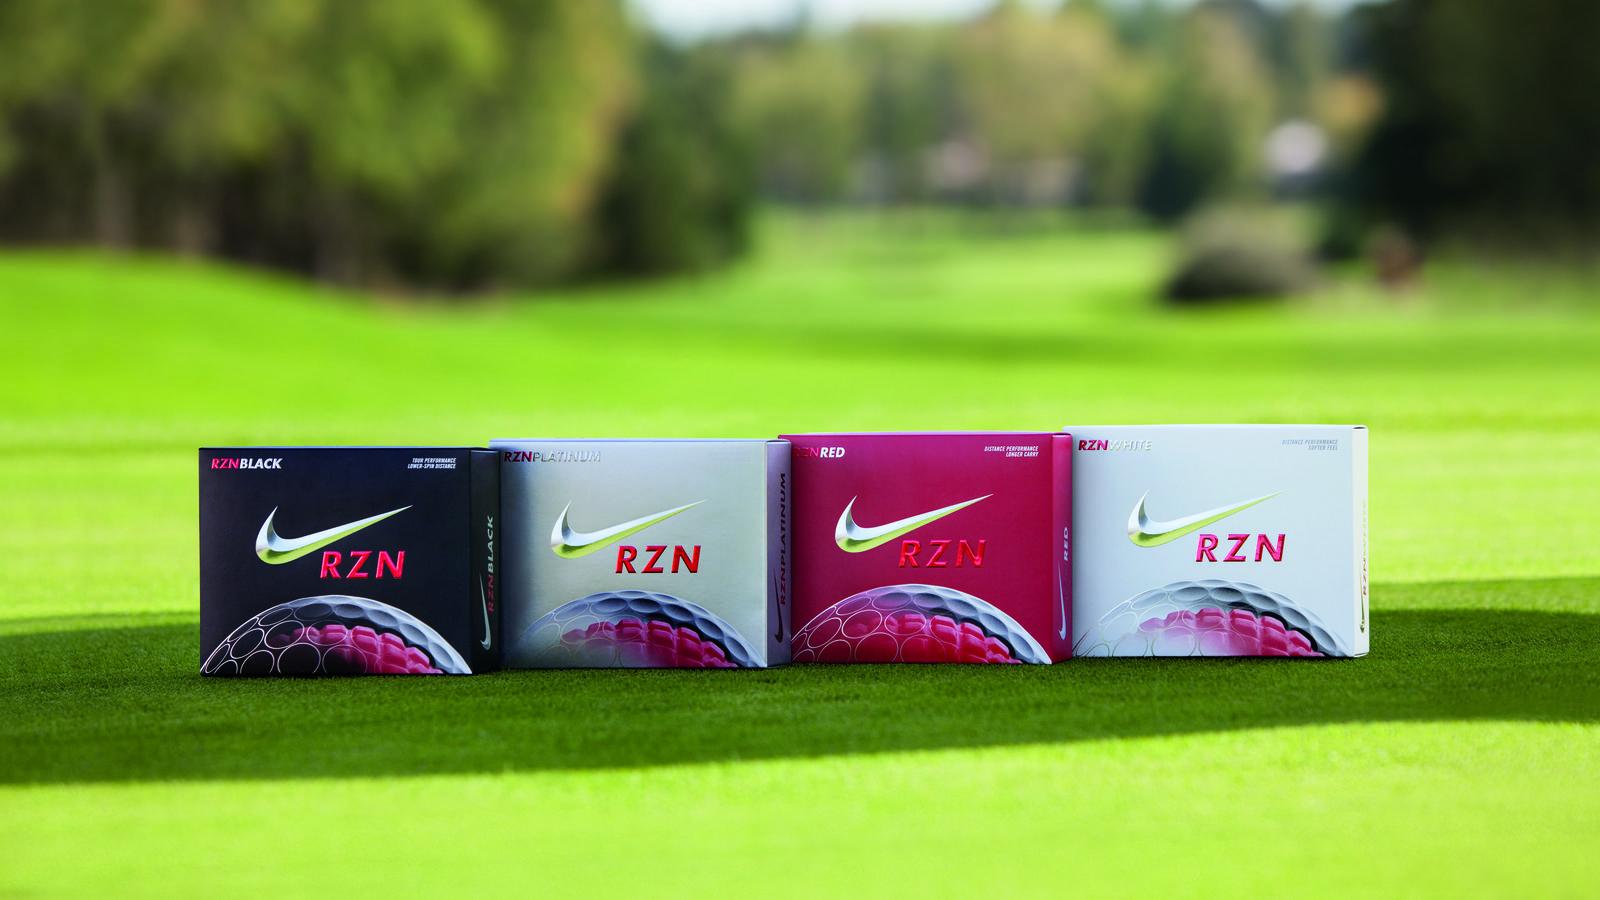 RZN Golf Balls